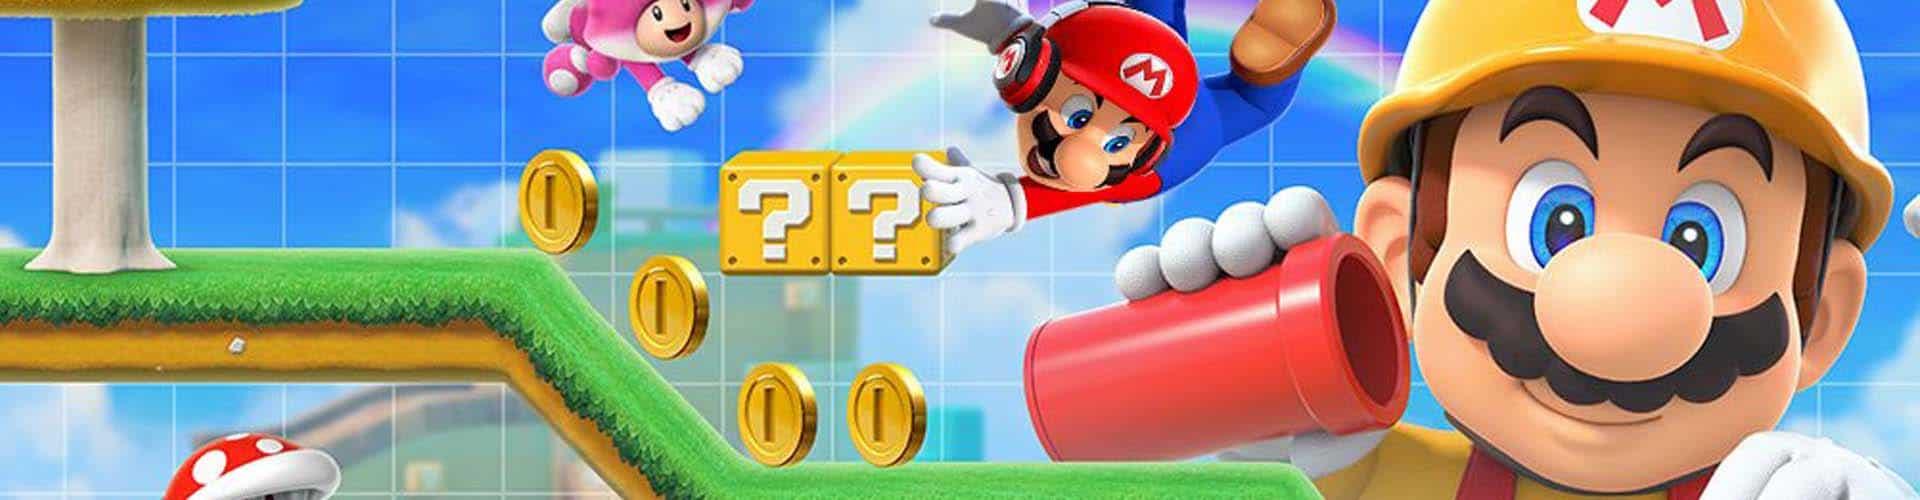 Super Mario Maker 2 Release Date, News, Trailer And Rumors